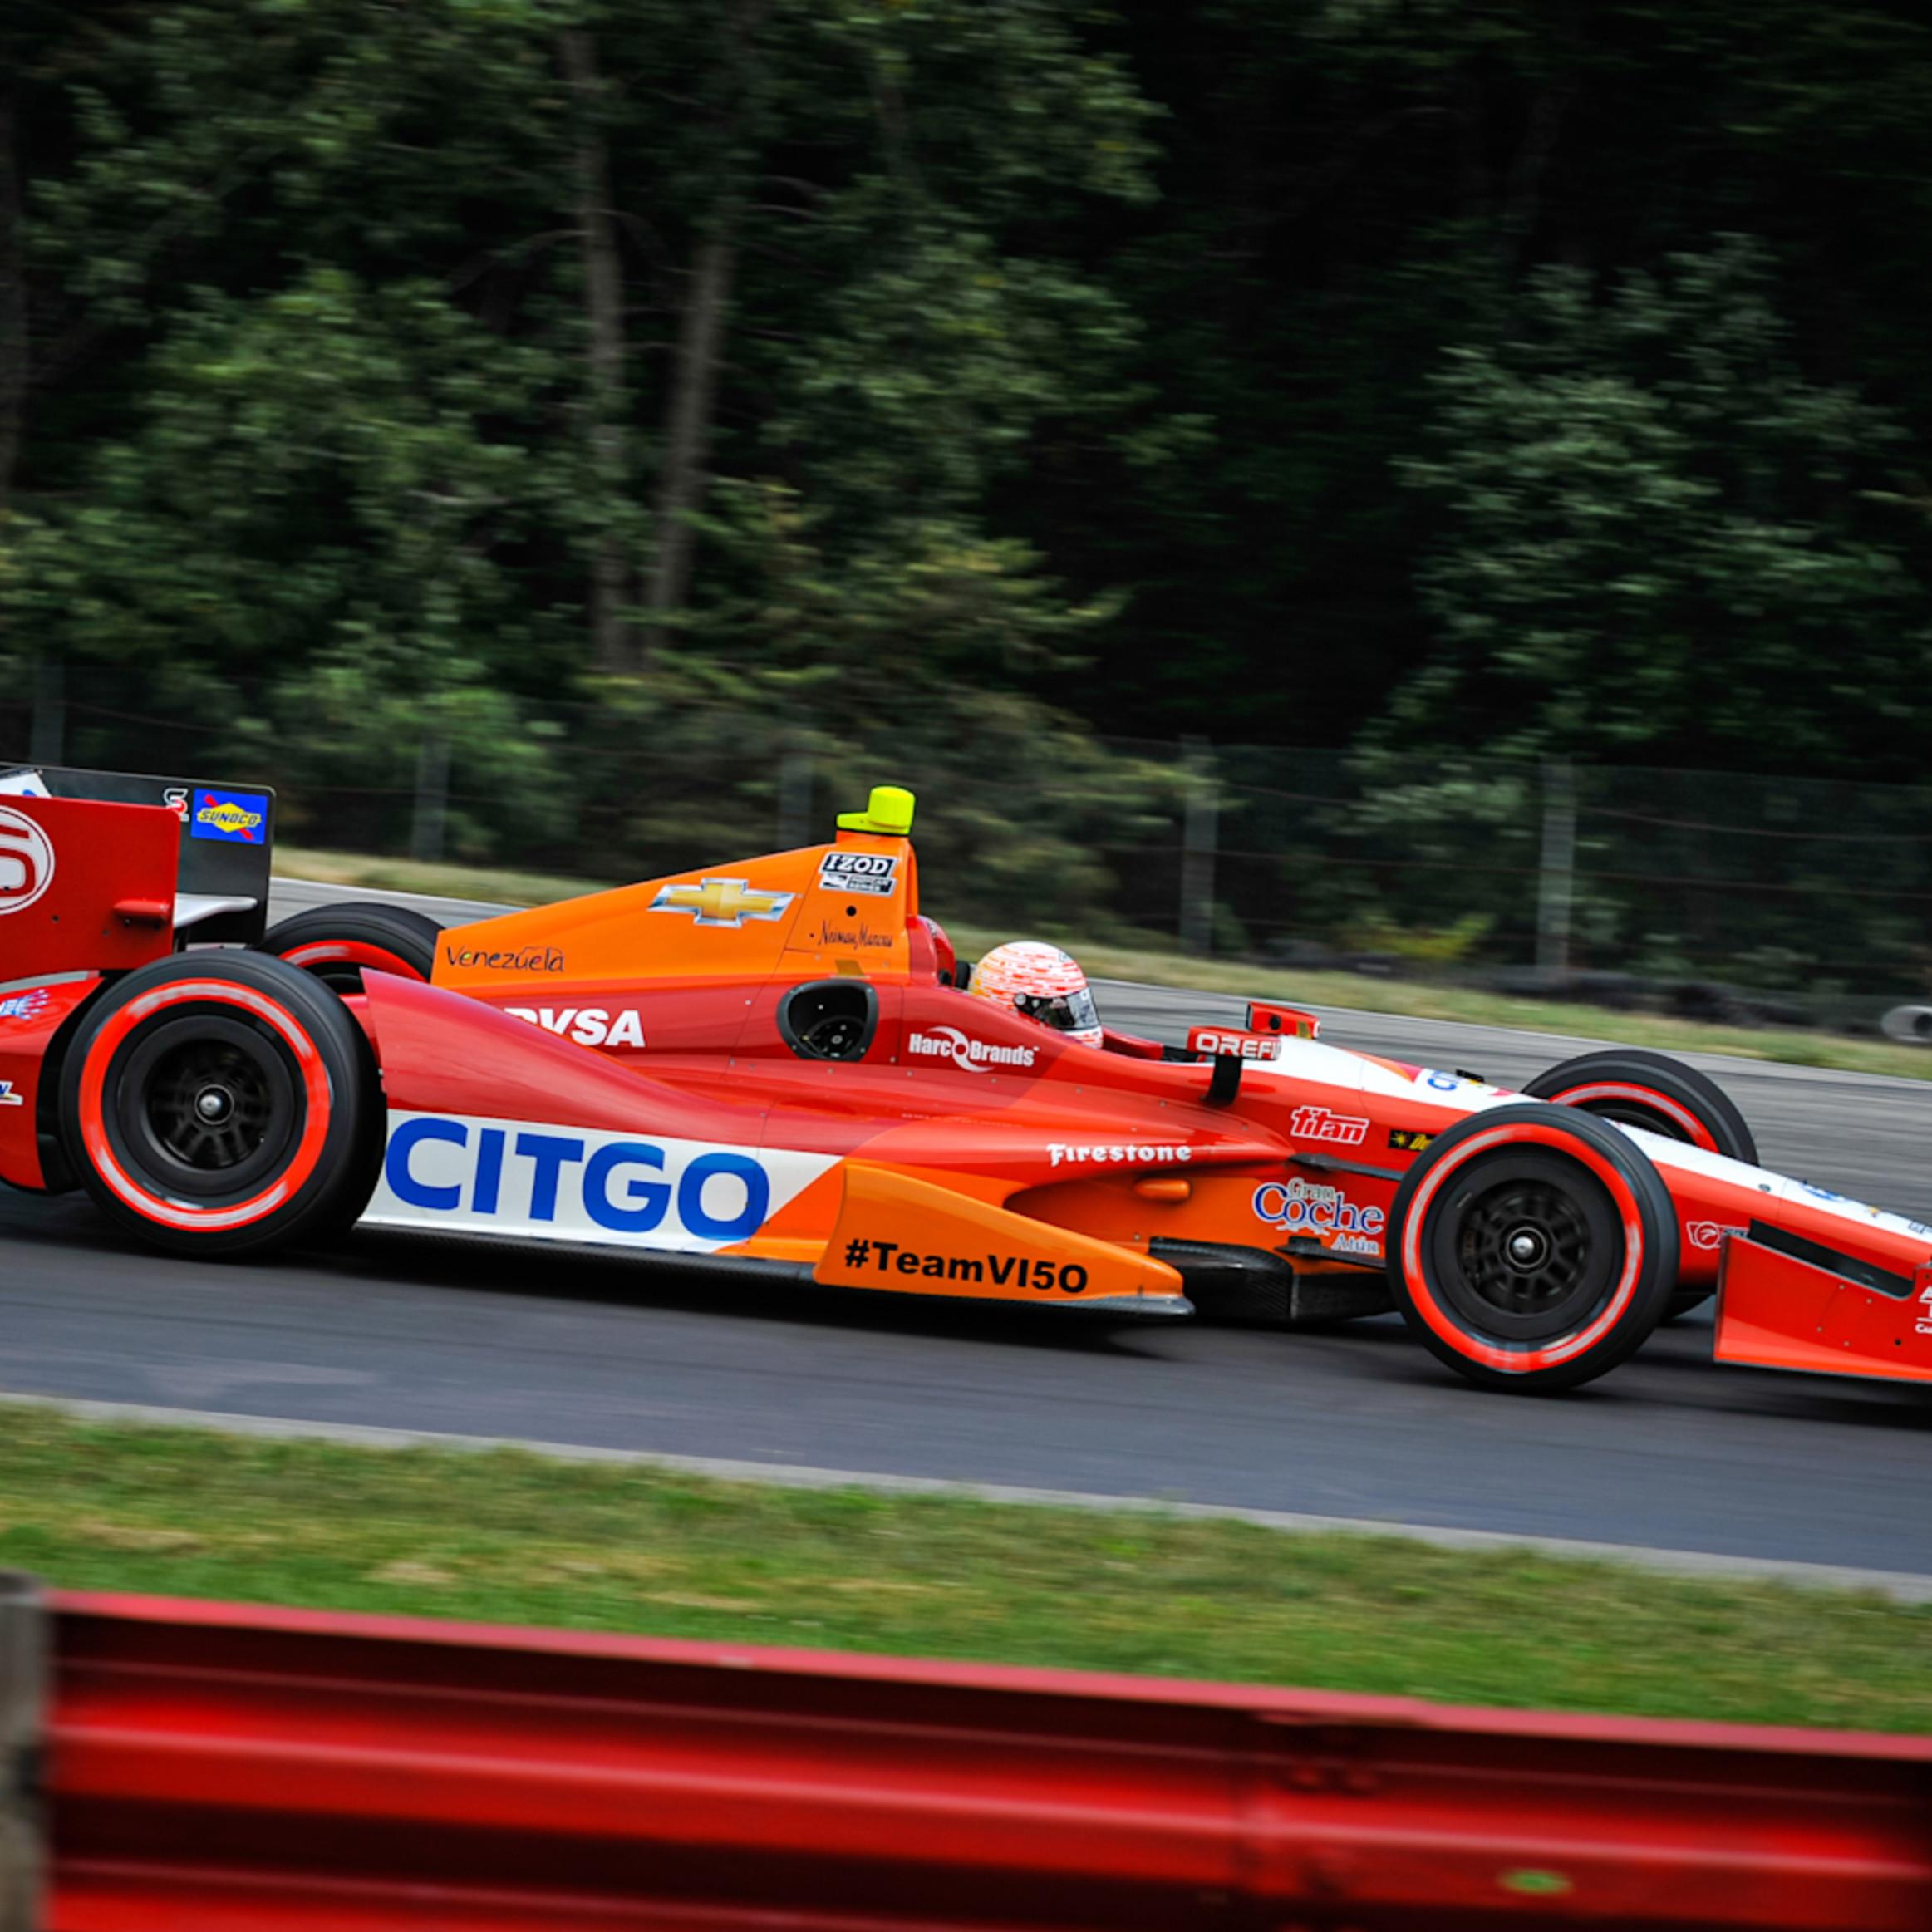 Citgo formula 1 car achfeg